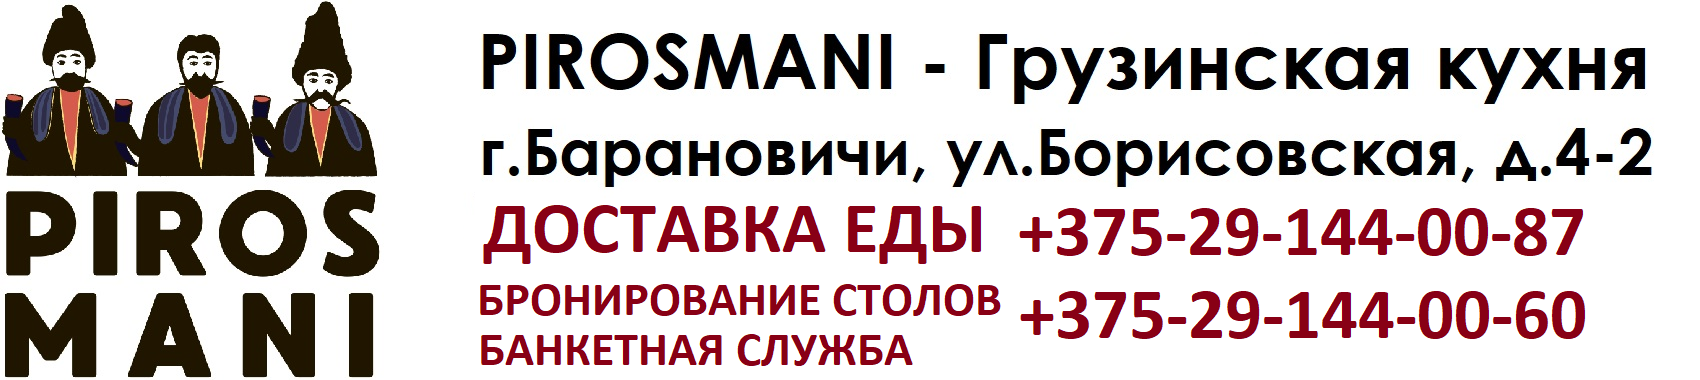 PIROSMANI — Грузинская кухня